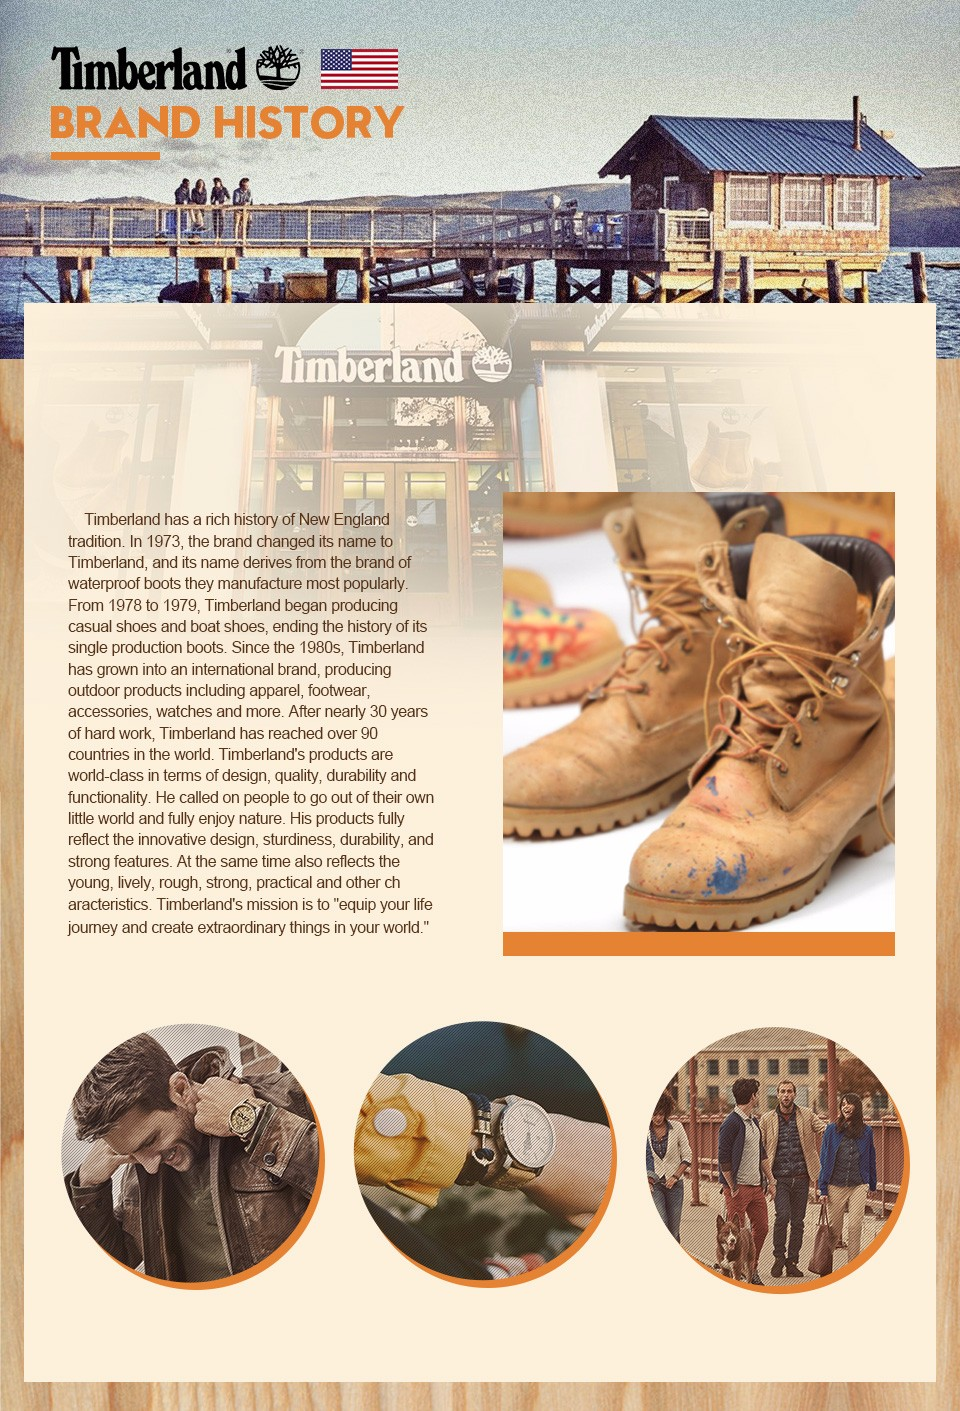 Timberland brand story